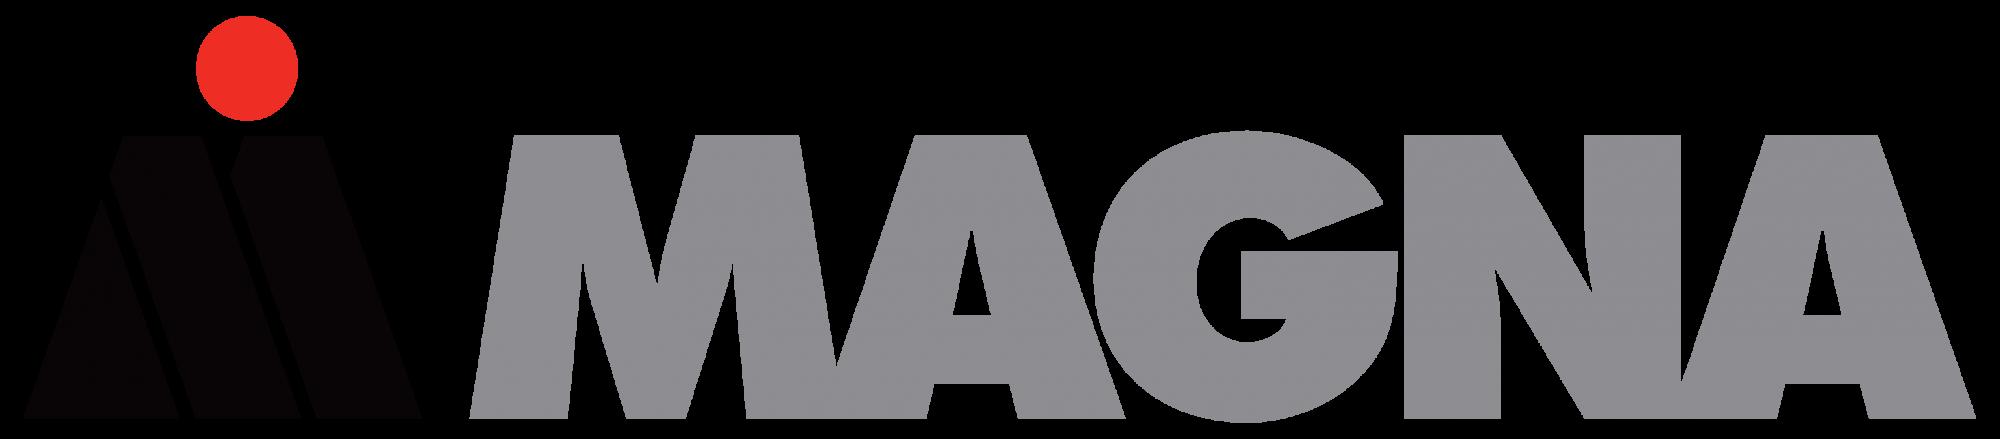 http://www.trucktownthunder.com/wp-content/uploads/2018/02/Magna-Logo-HR.png